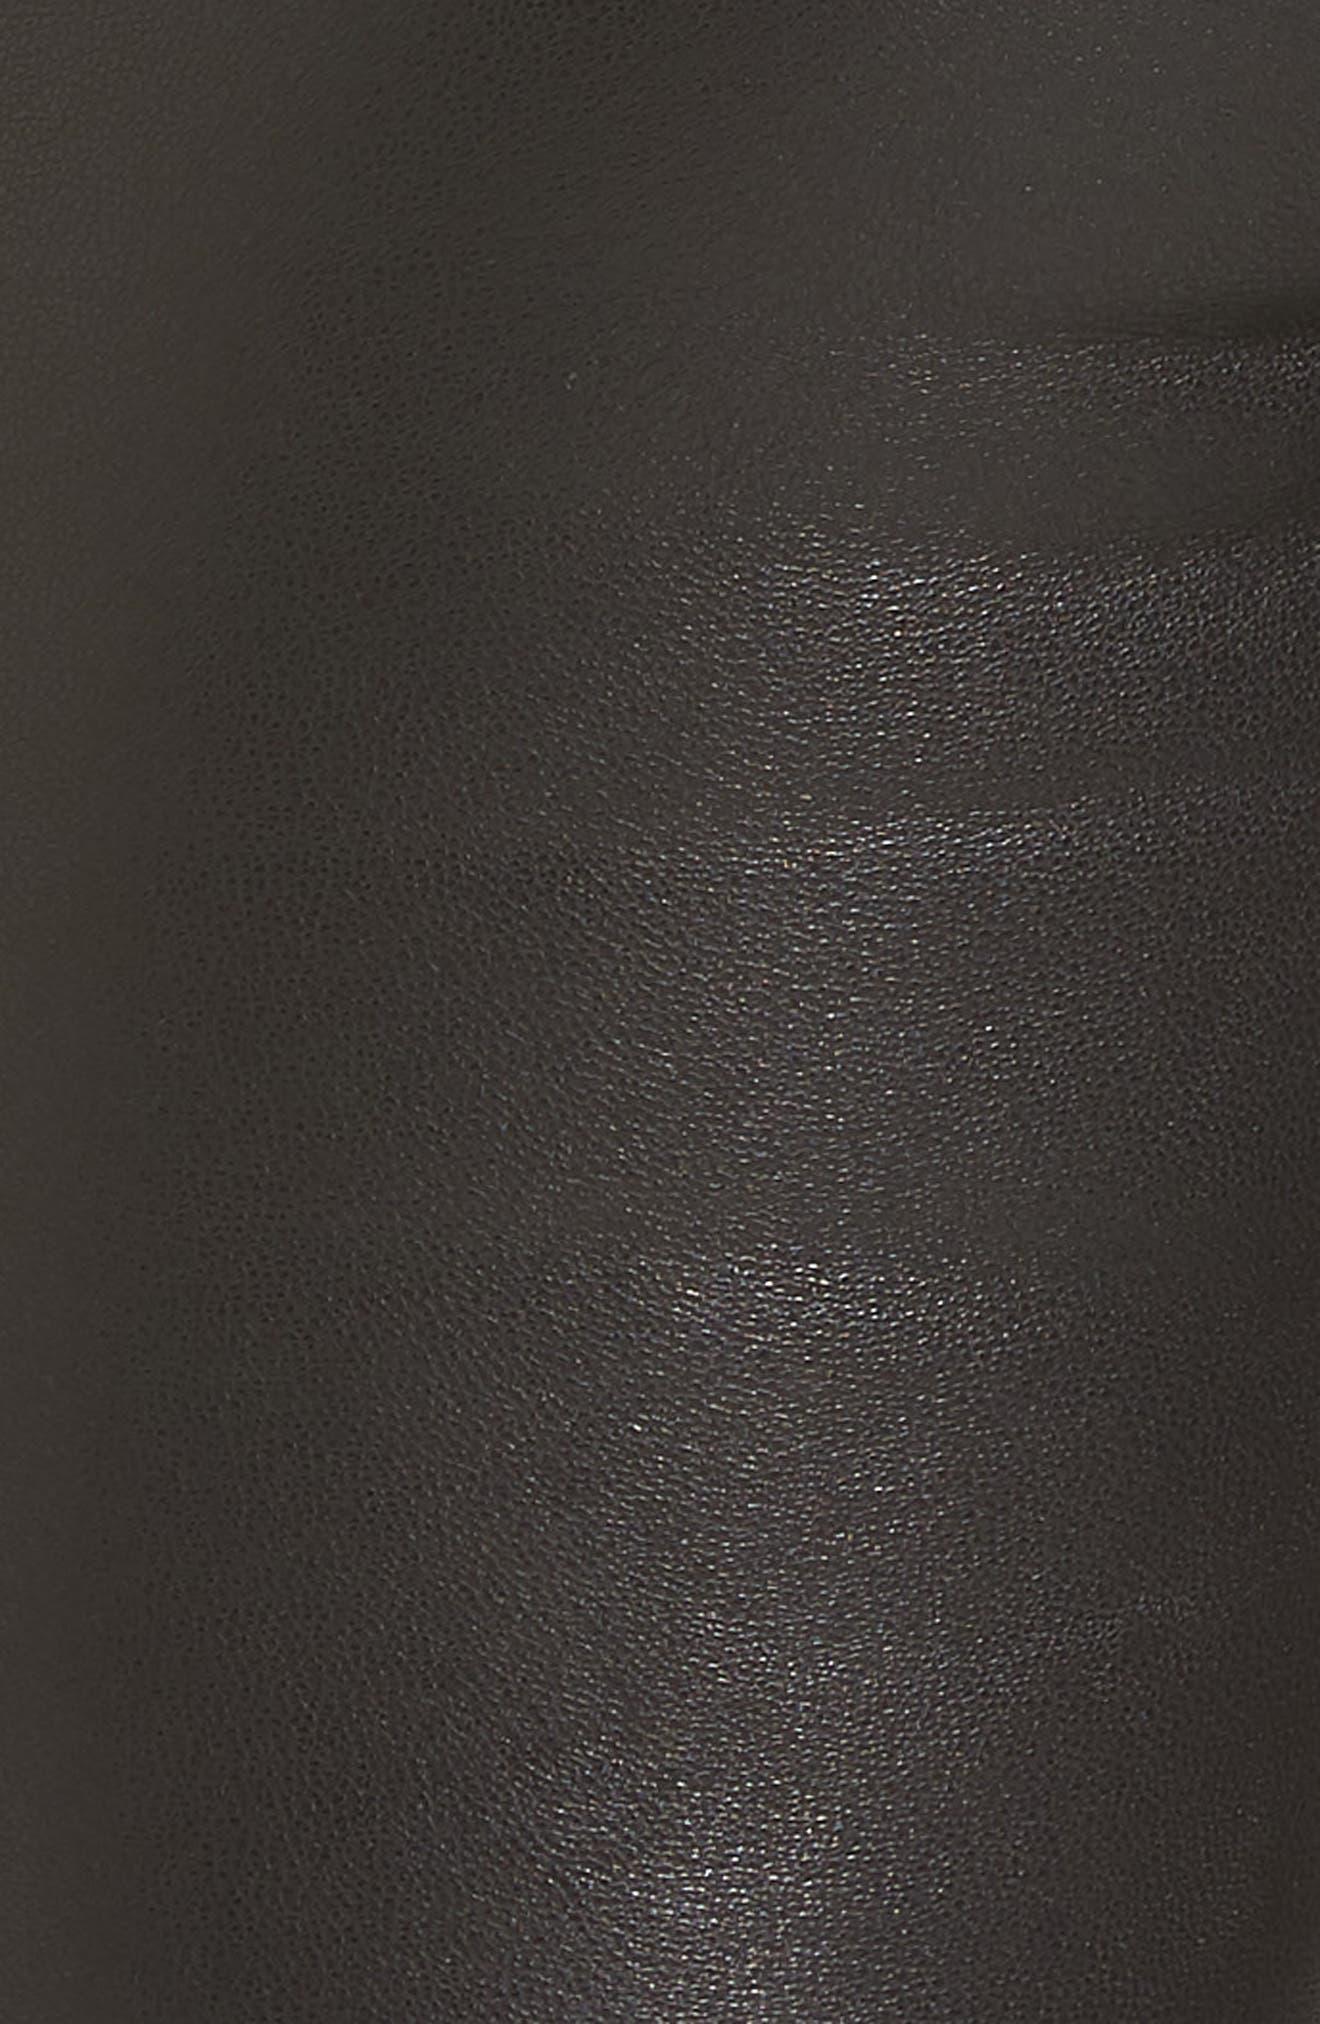 Barbara High Waist Ankle Skinny Leather Pants,                             Alternate thumbnail 5, color,                             Black Leather